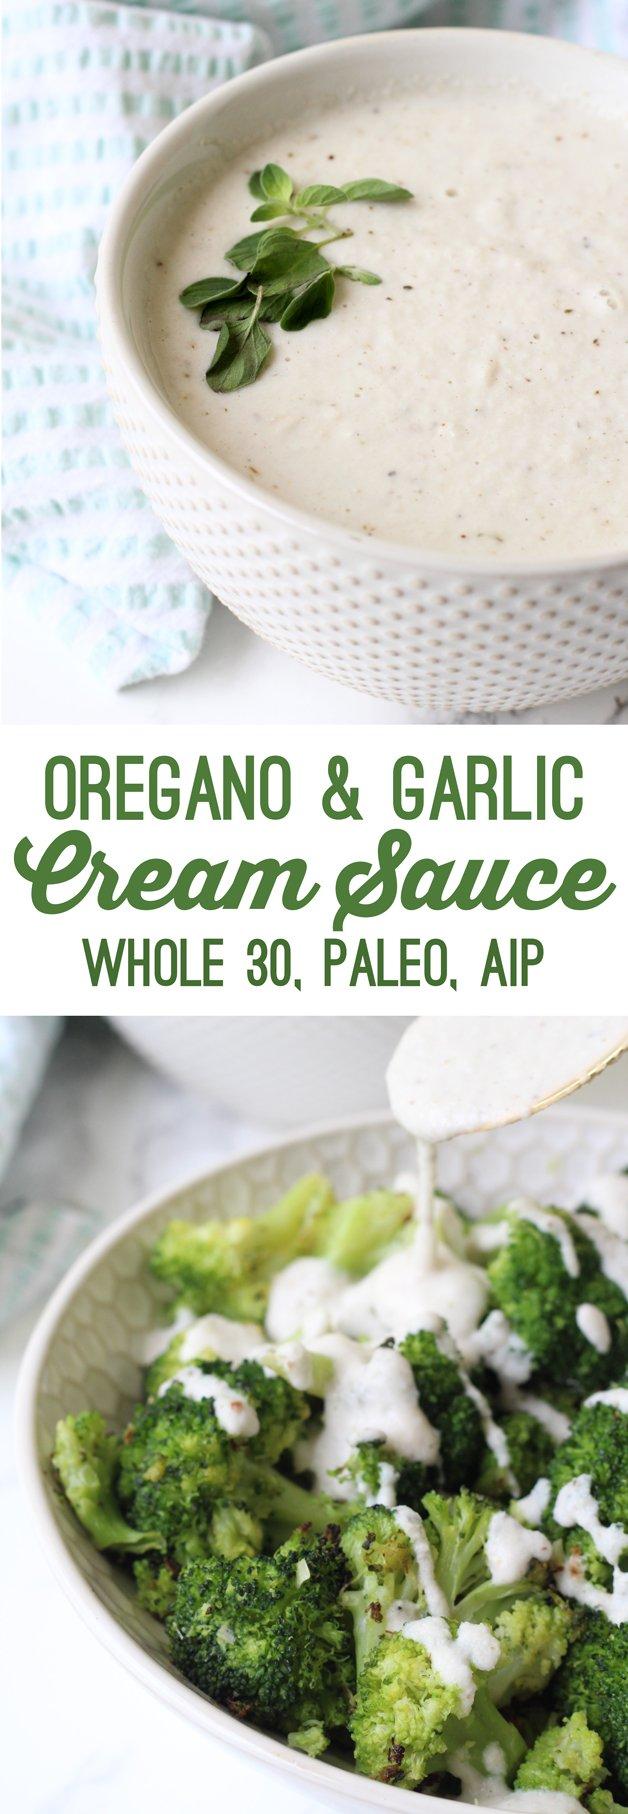 Oregano Garlic Cream Sauce (Whole 30, Paleo, AIP)